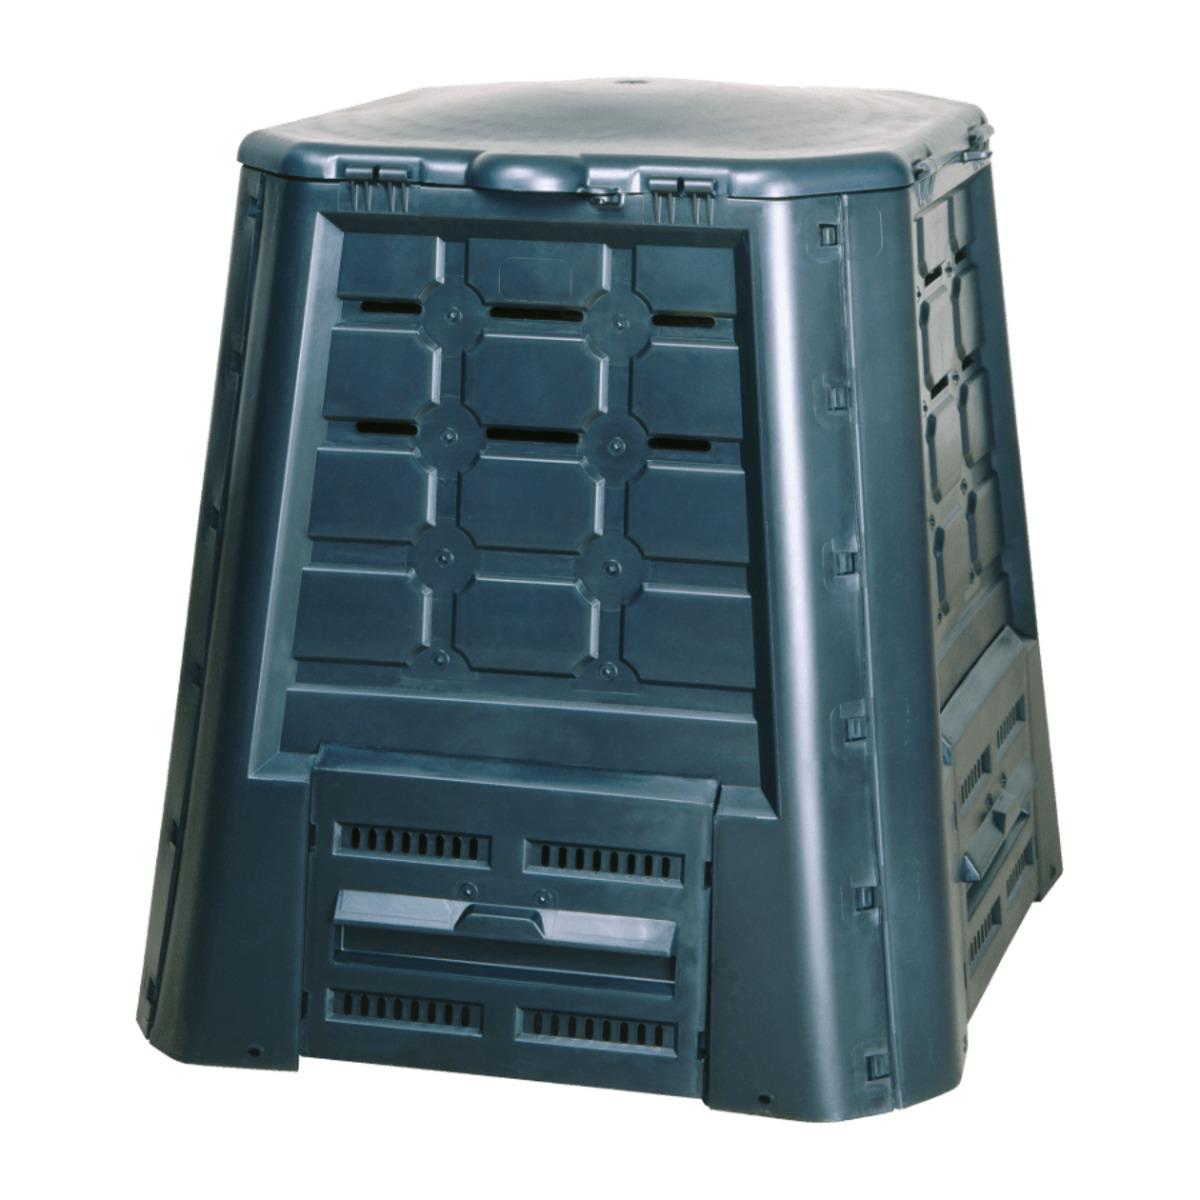 Bild 1 von GARDEN FEELINGS     Thermo-Komposter